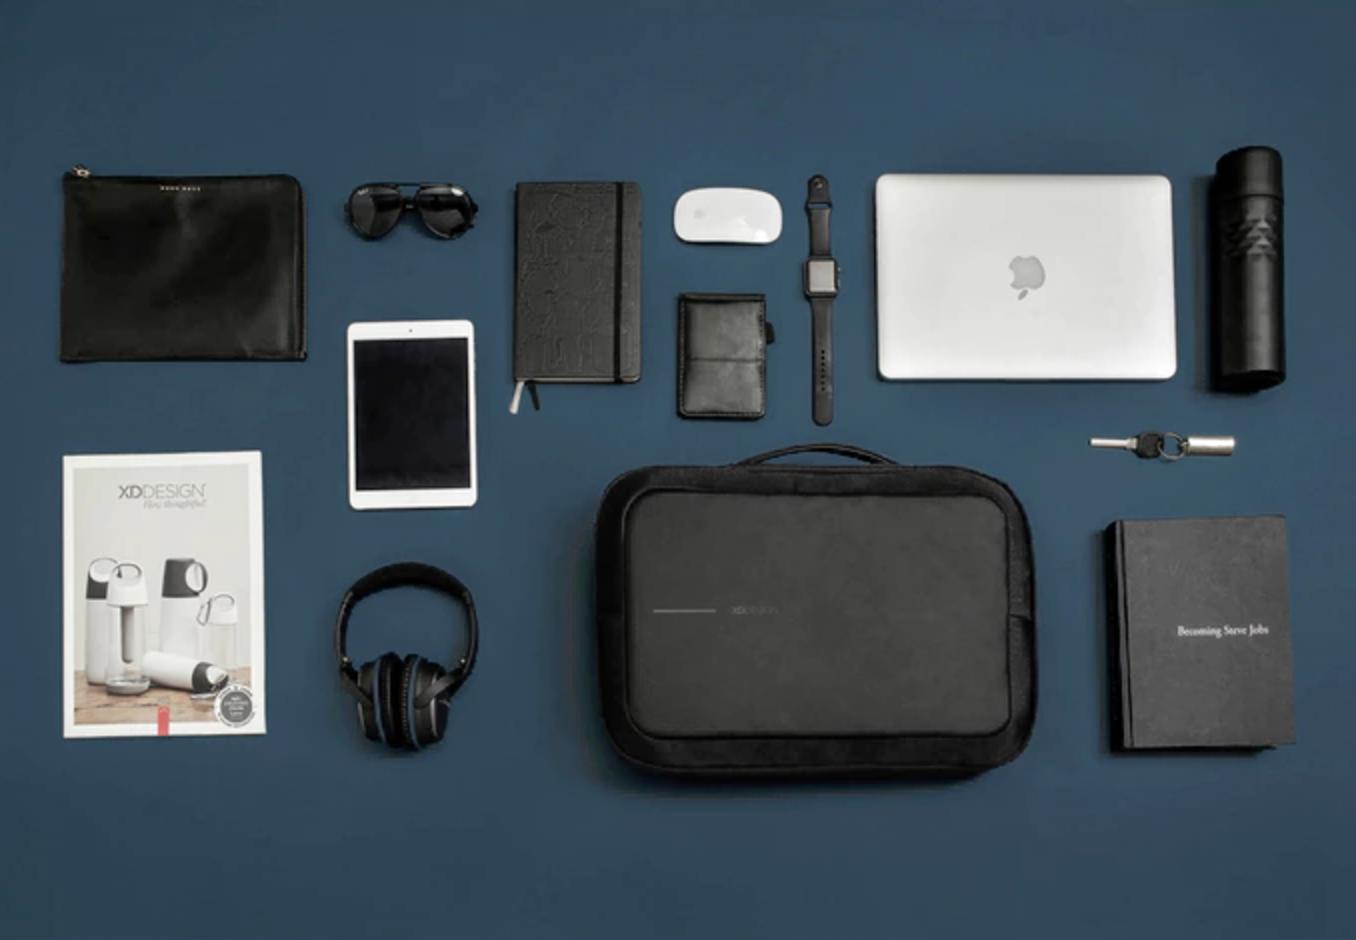 briefcase safe photo - 1